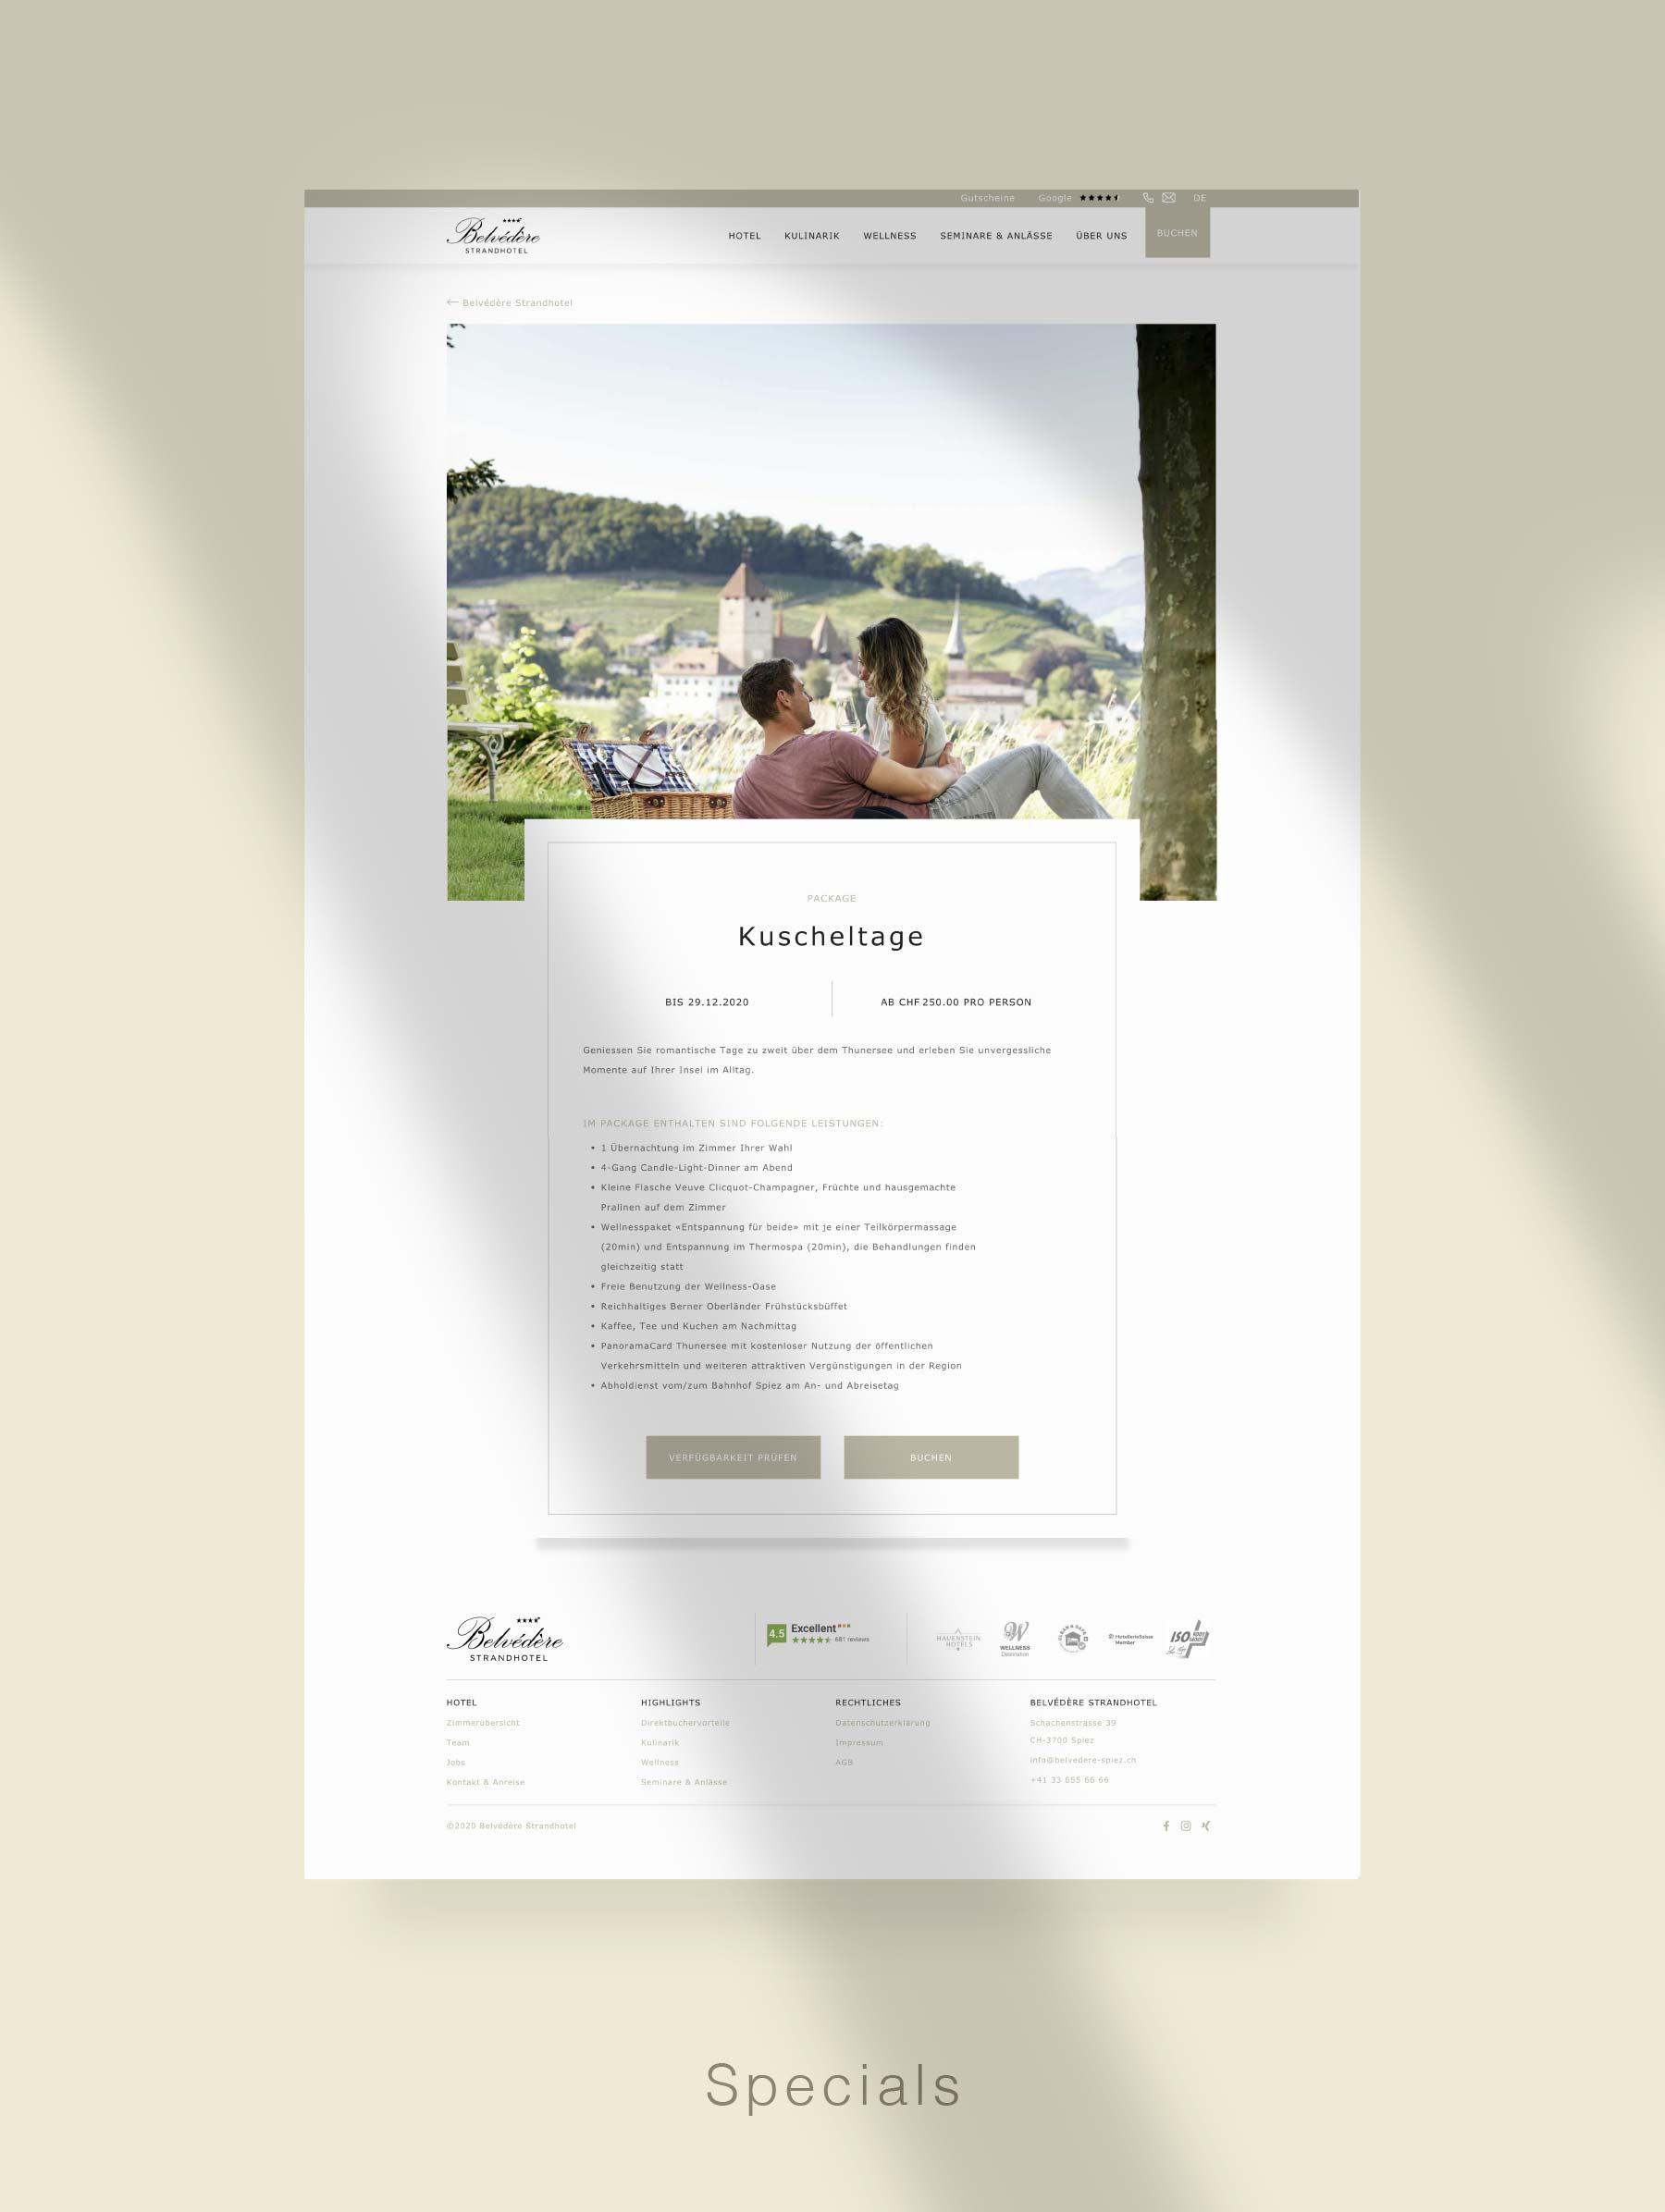 Landingpage for campaigns - Website development for Hotel Switzerland